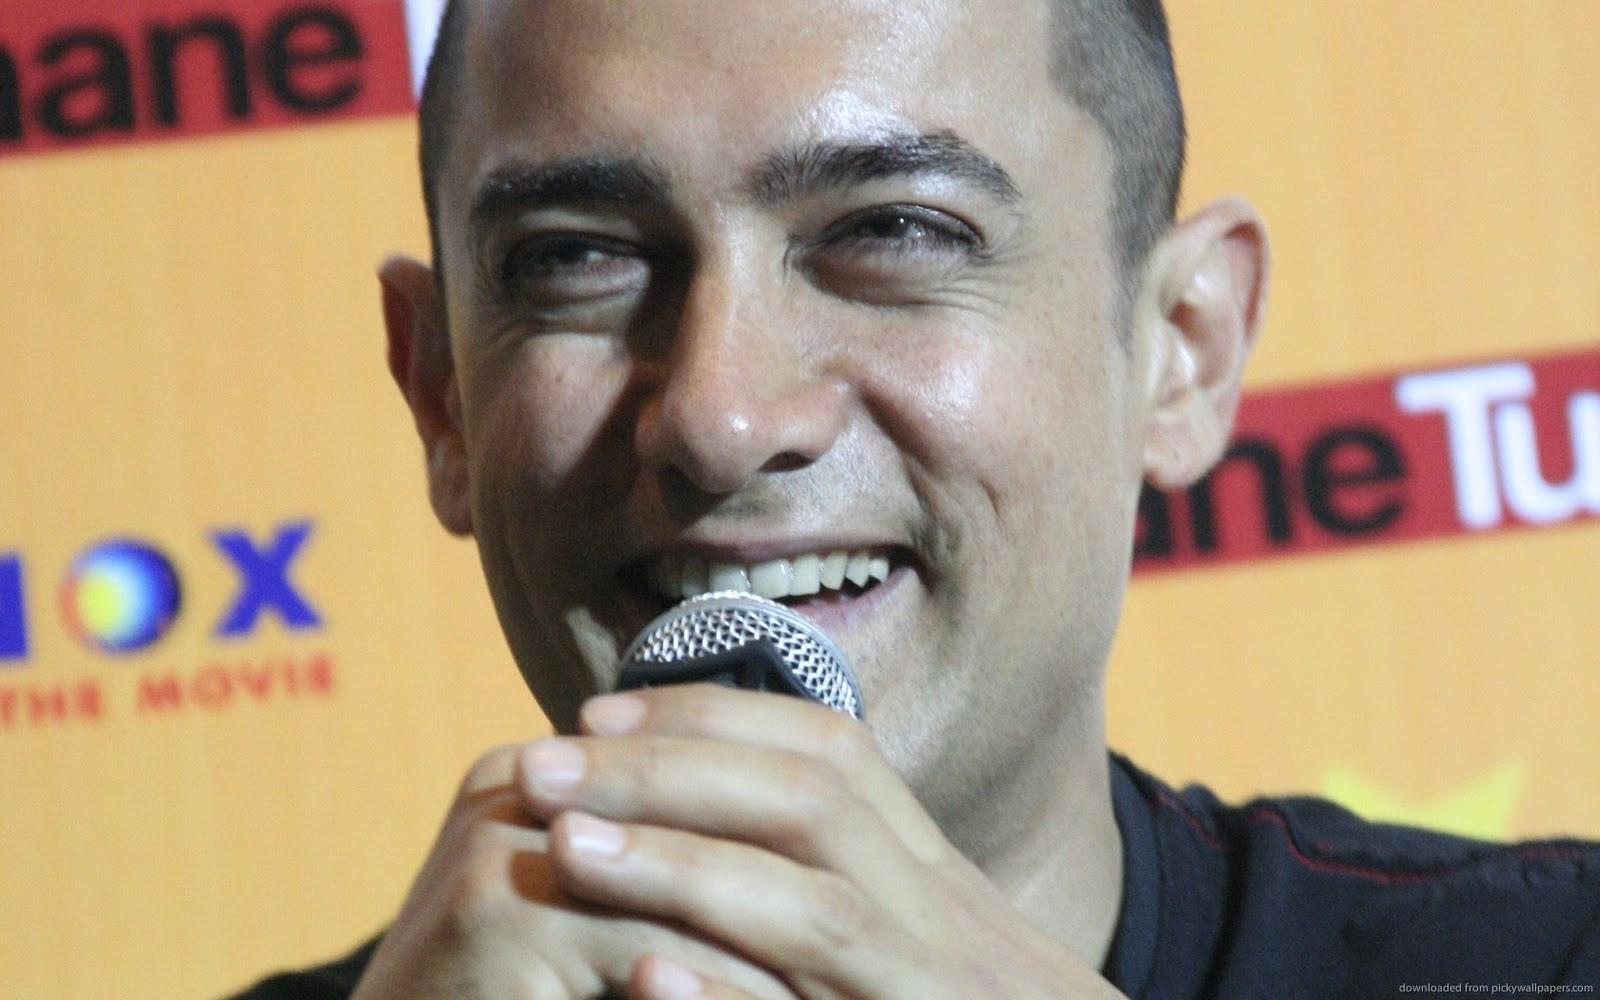 Aamir Khan Pic Download: Bollywood Aamir Khan HD Wallpaper Free Download